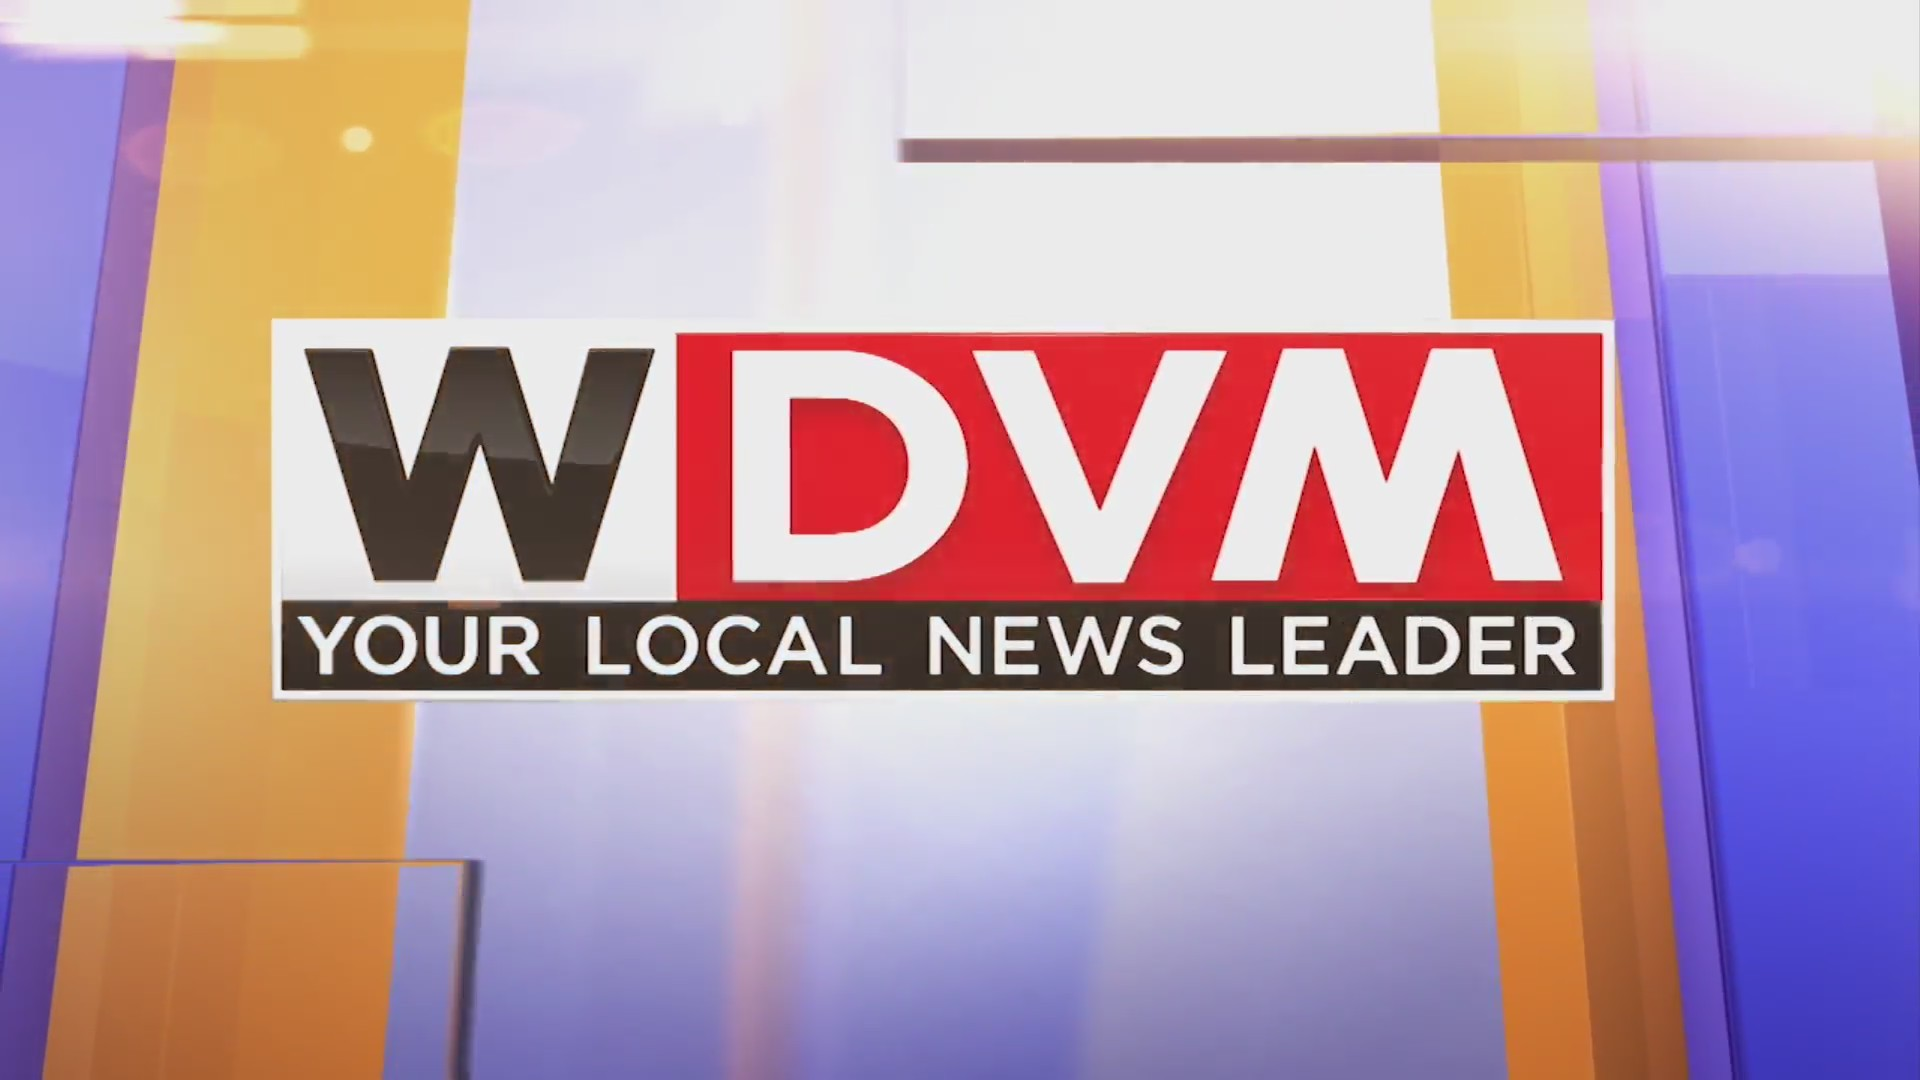 WDVM_News_at_10_p_m__0_20180604043909